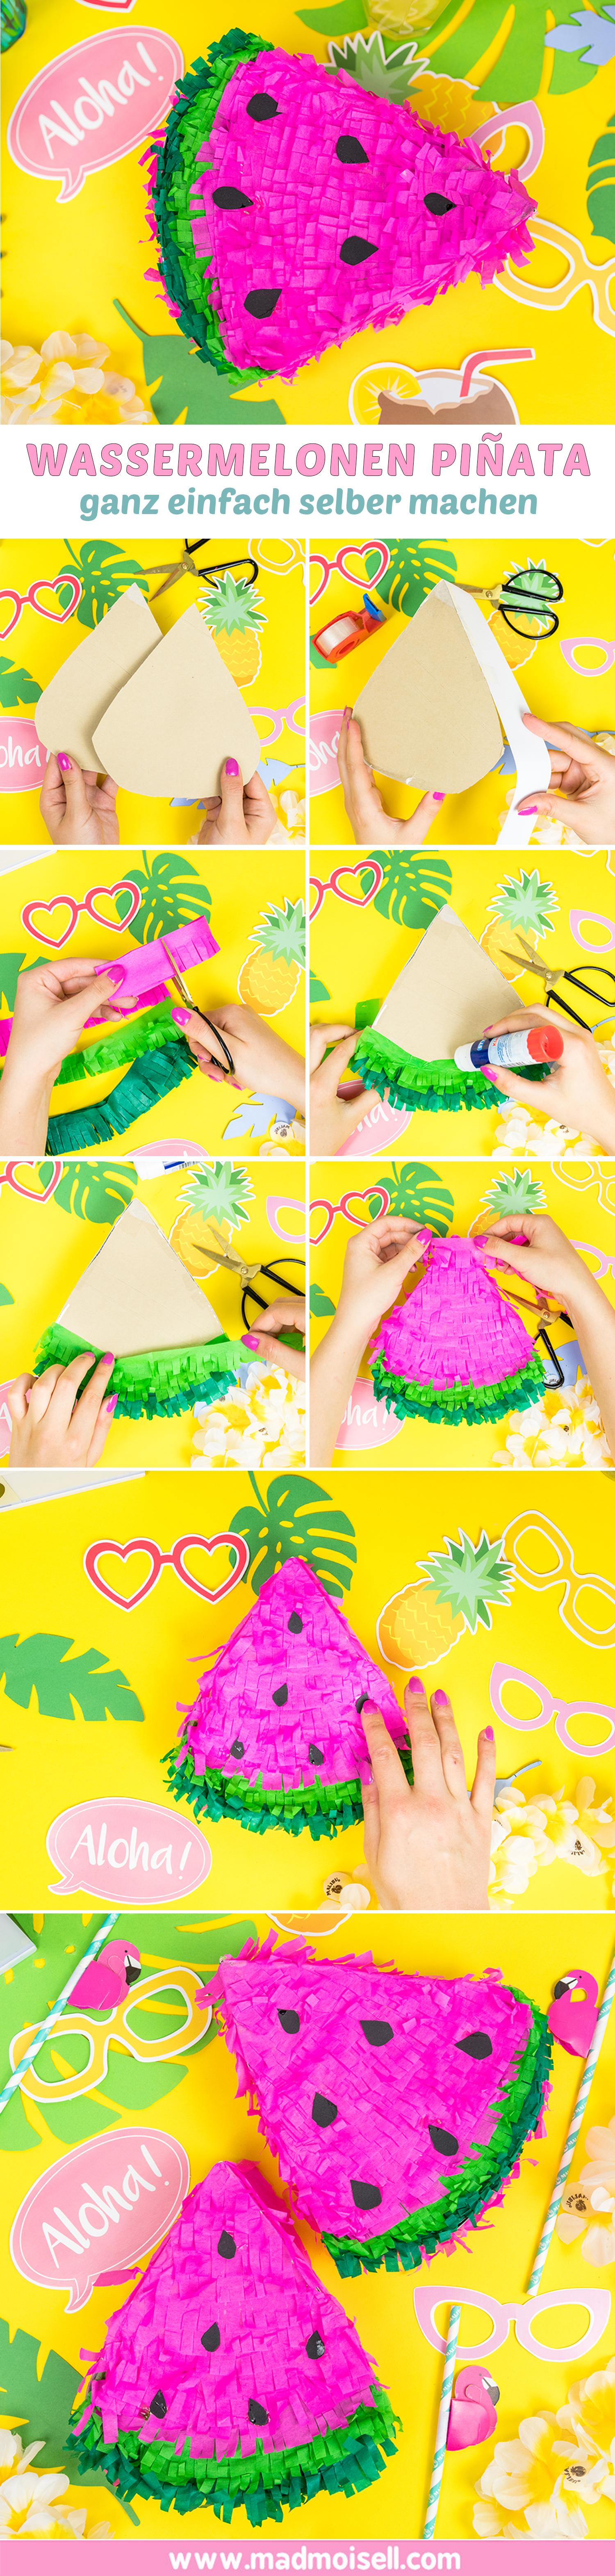 Sommer Party DIY Idee Wassermelonen Pinata selber basteln DIY Blog